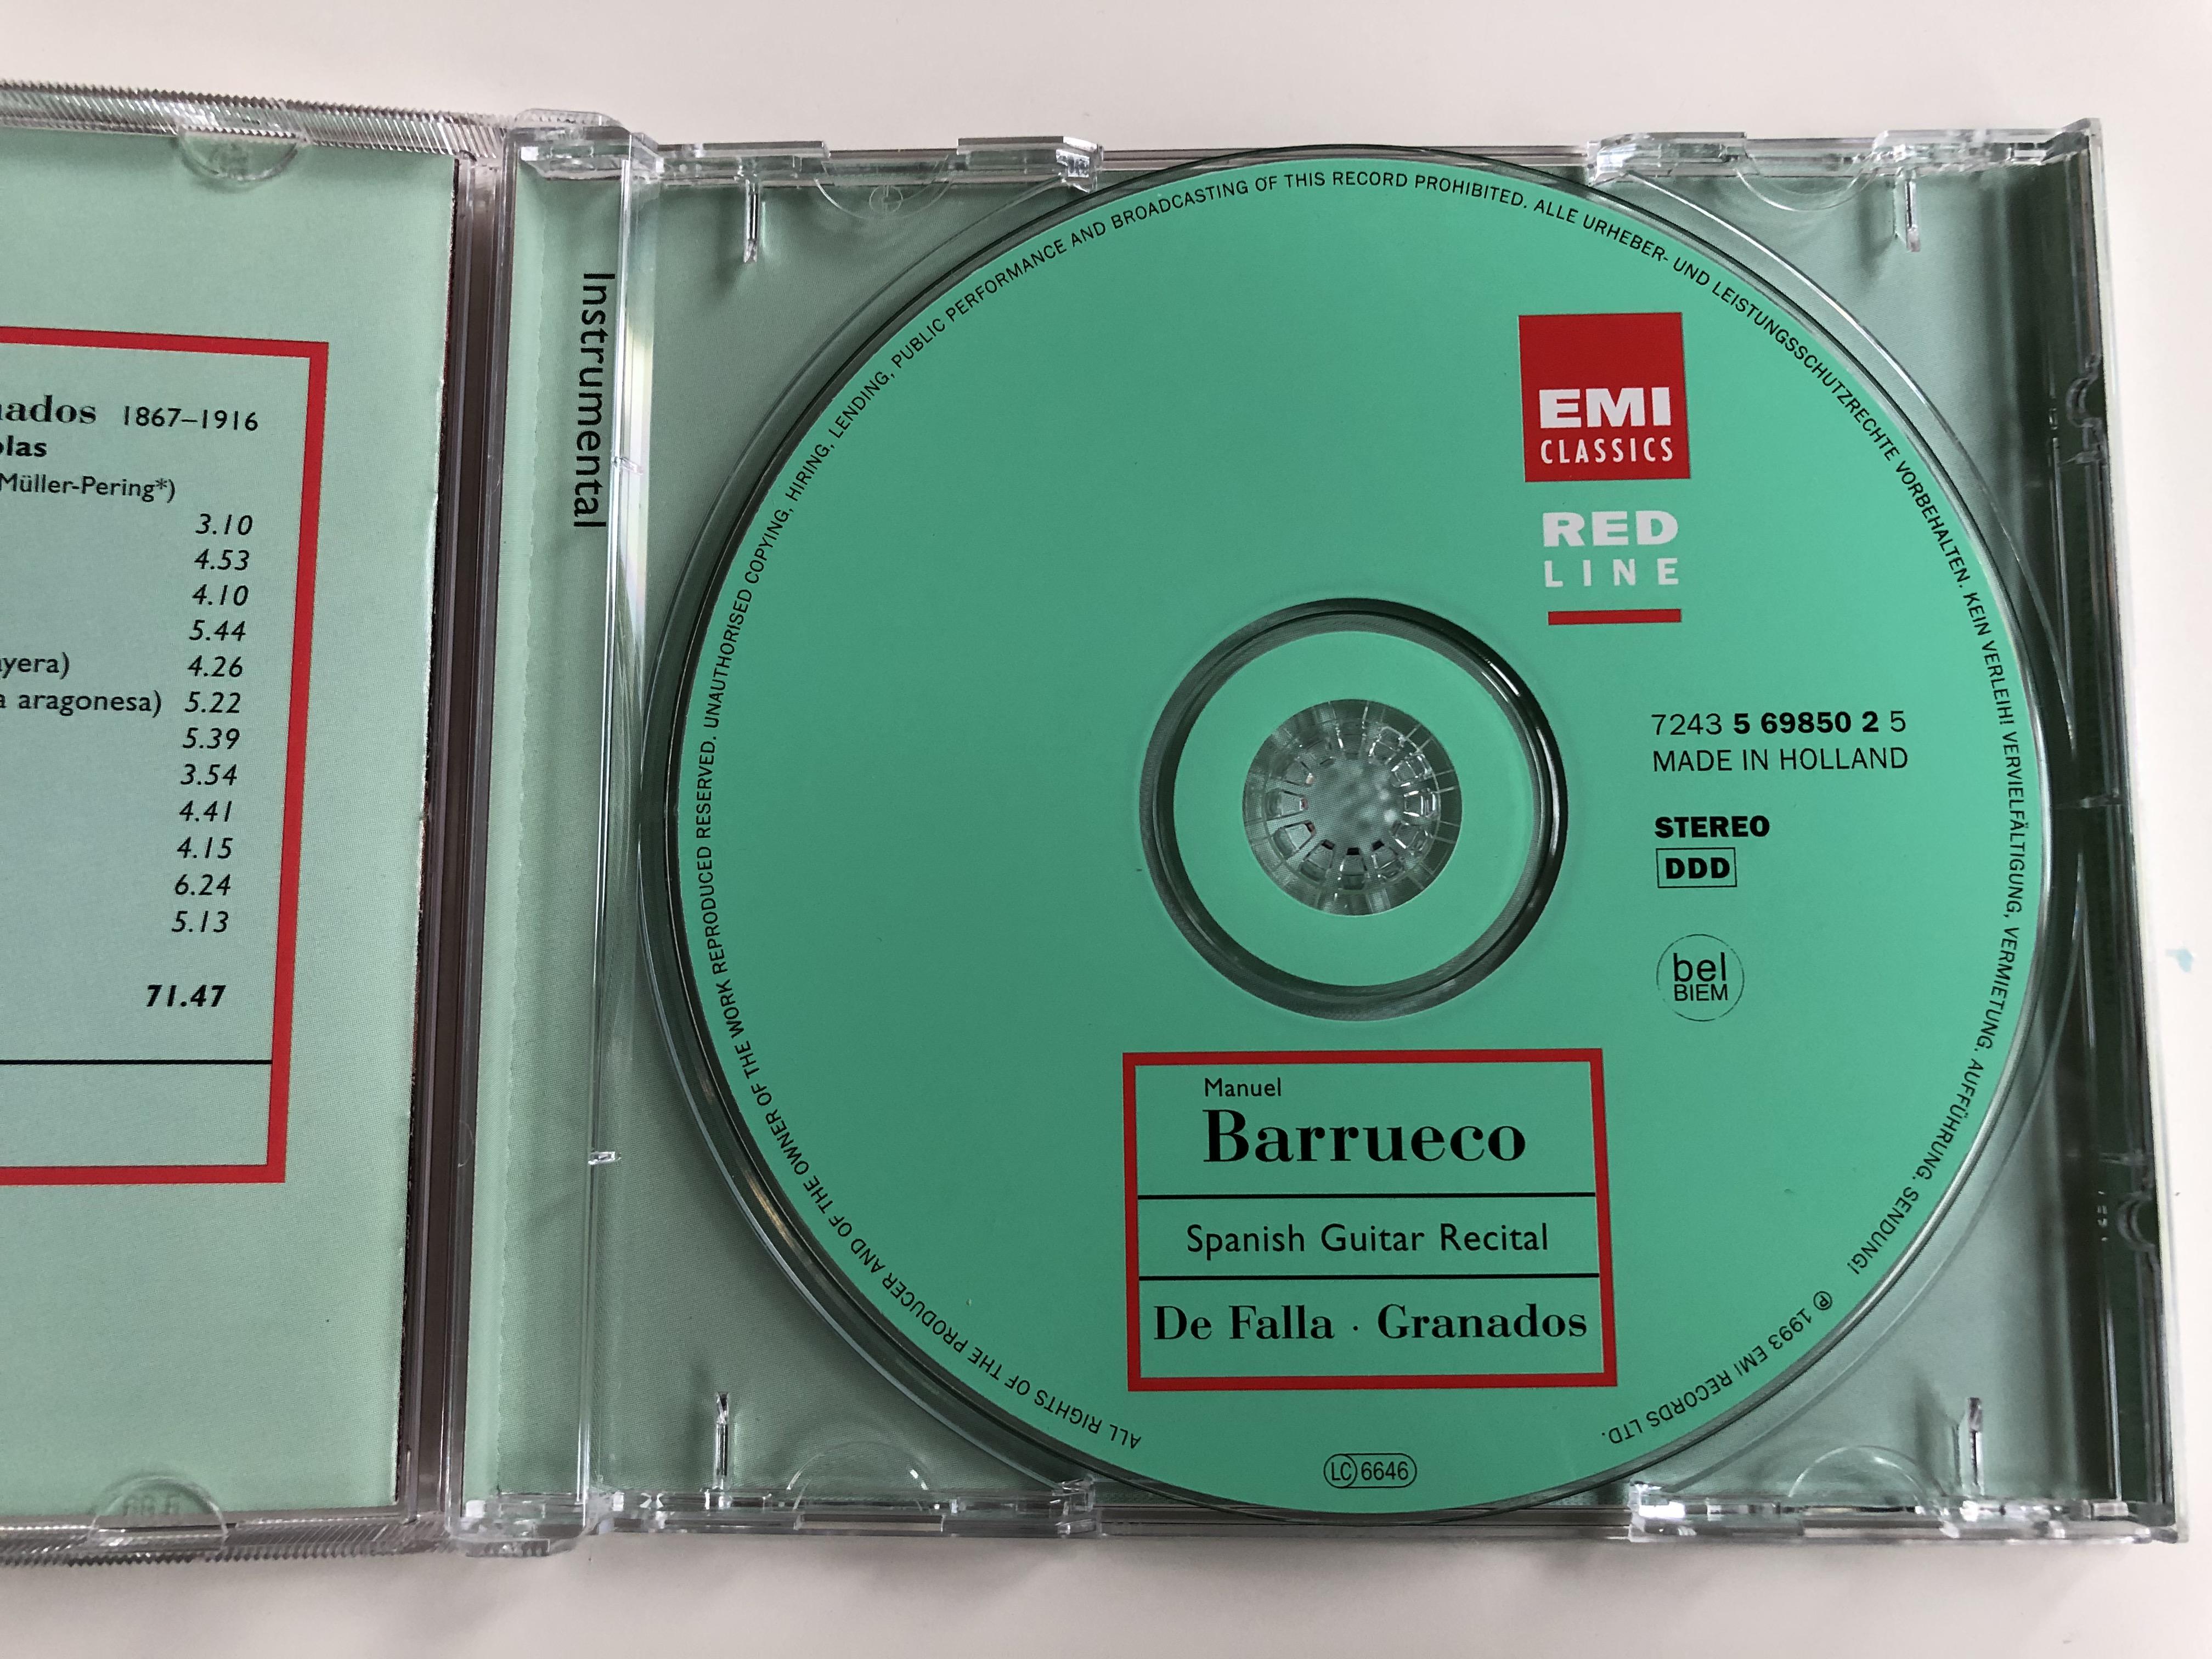 manuel-barrueco-spanish-guitar-recital-de-falla-granados-emi-classic-audio-cd-1997-stereo-724356985025-3-.jpg